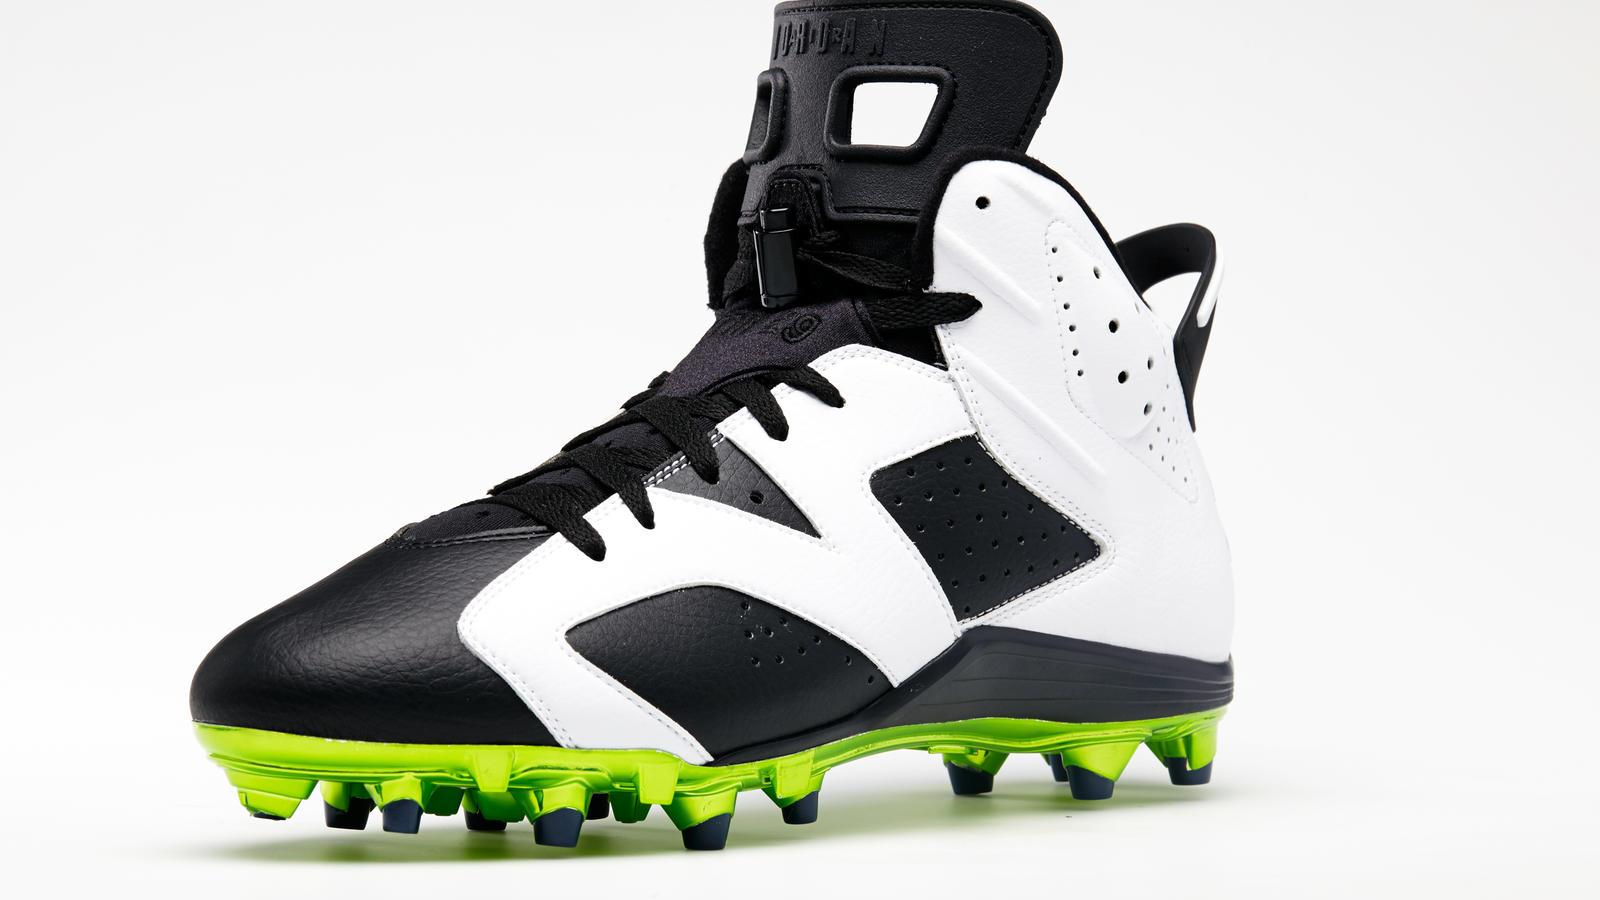 best sneakers 41fcc d0838 canada air jordan 6 retro six august 2014 a6fdc 7aa4d